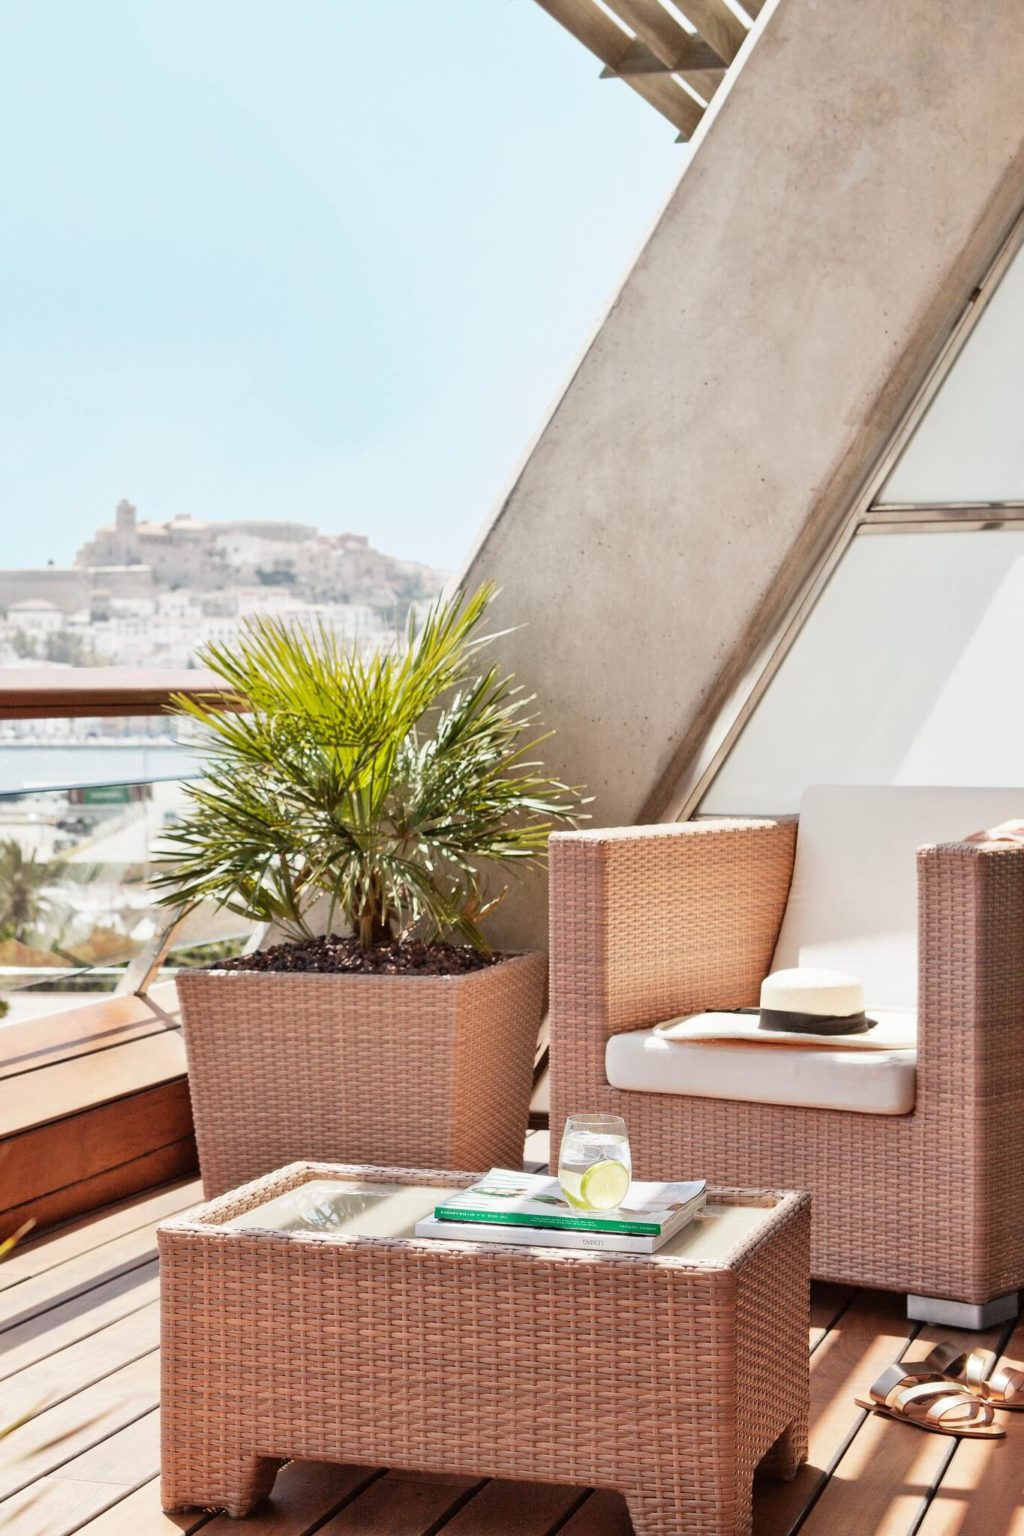 https://www.white-ibiza.com/wp-content/uploads/2020/02/white-ibiza-hotels-ibiza-gran-hotel-2020-02-1024x1536.jpg